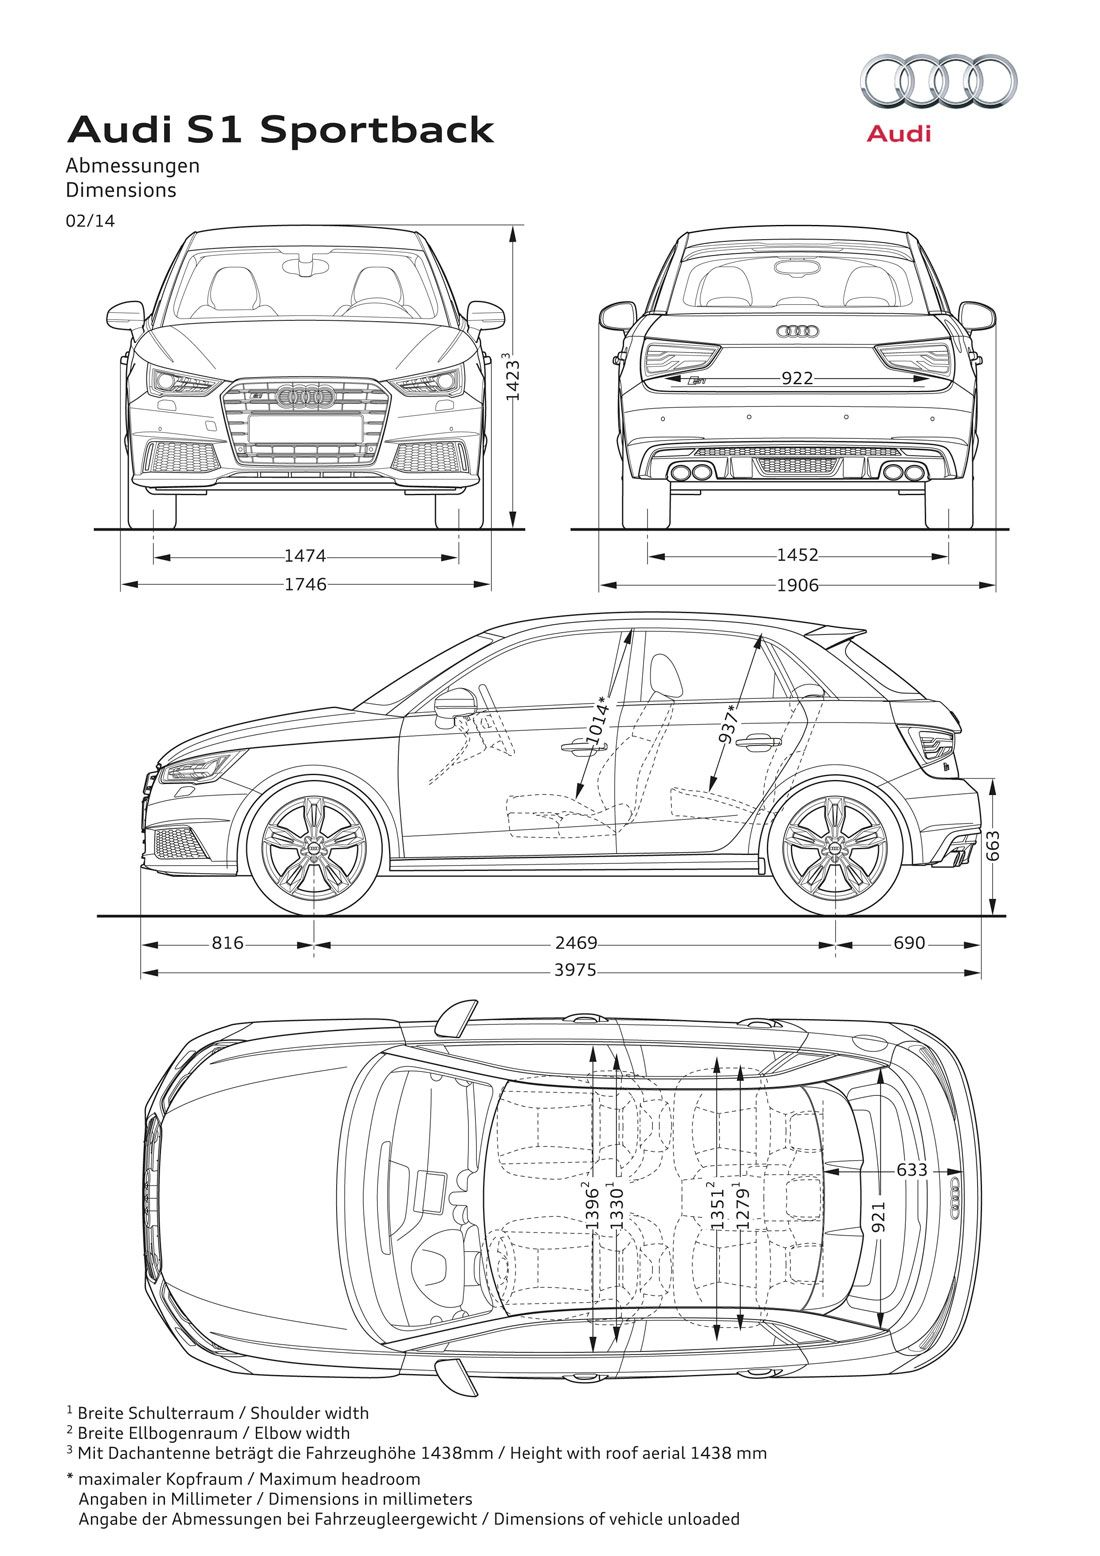 Audi S1 Sportback | Blueprints | Pinterest | Technische zeichnung ...